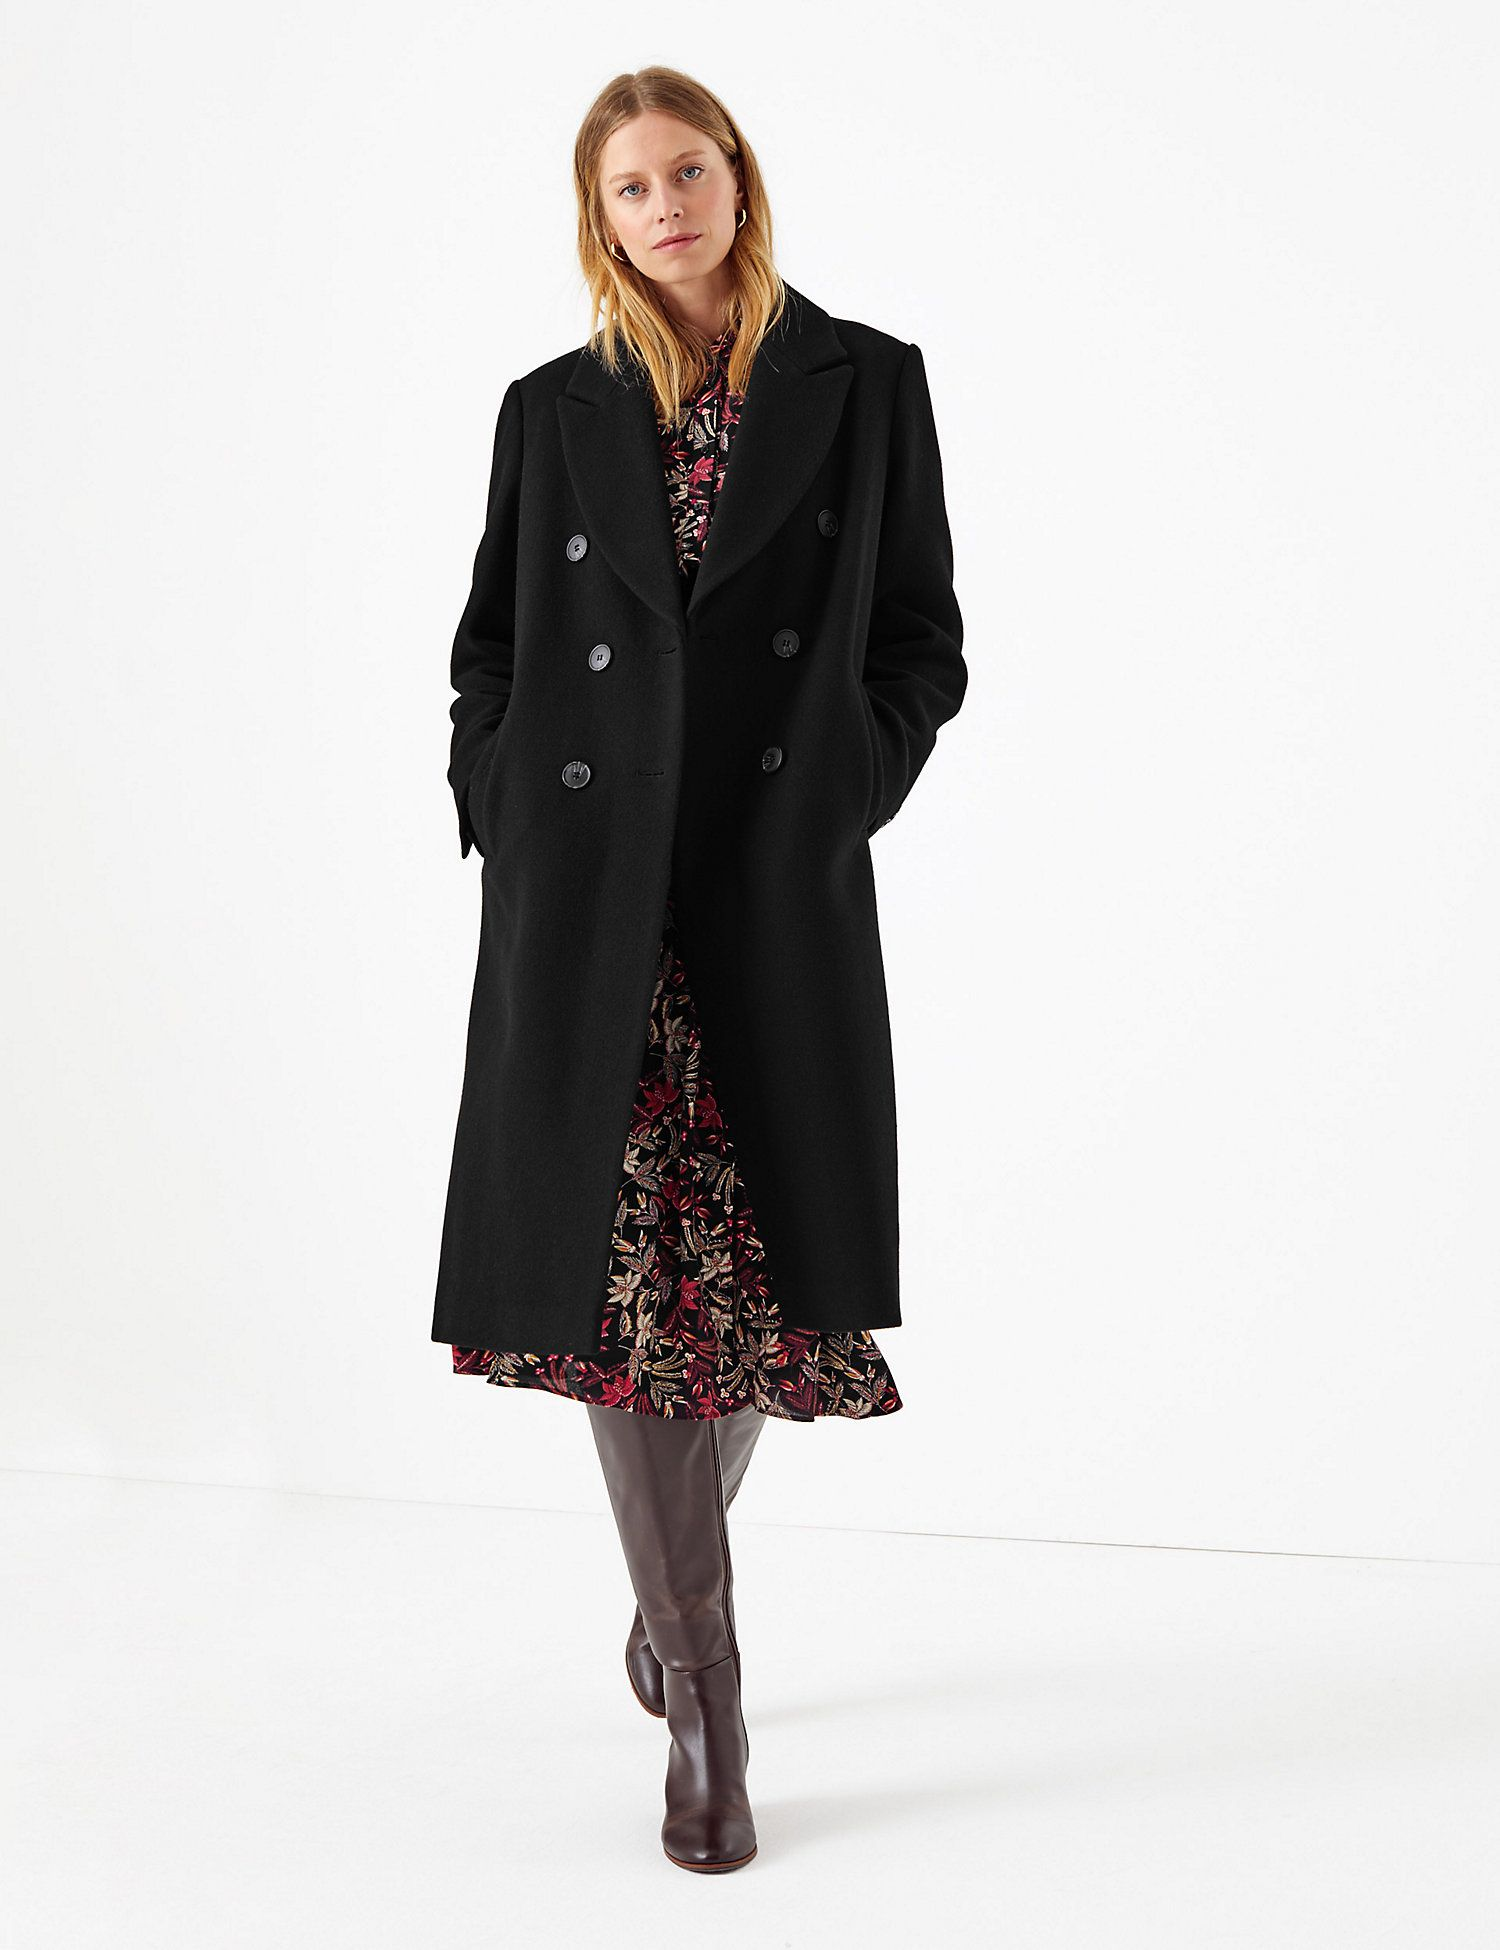 Marks & Spencer Wool Blend Single Breasted Coat   Melania